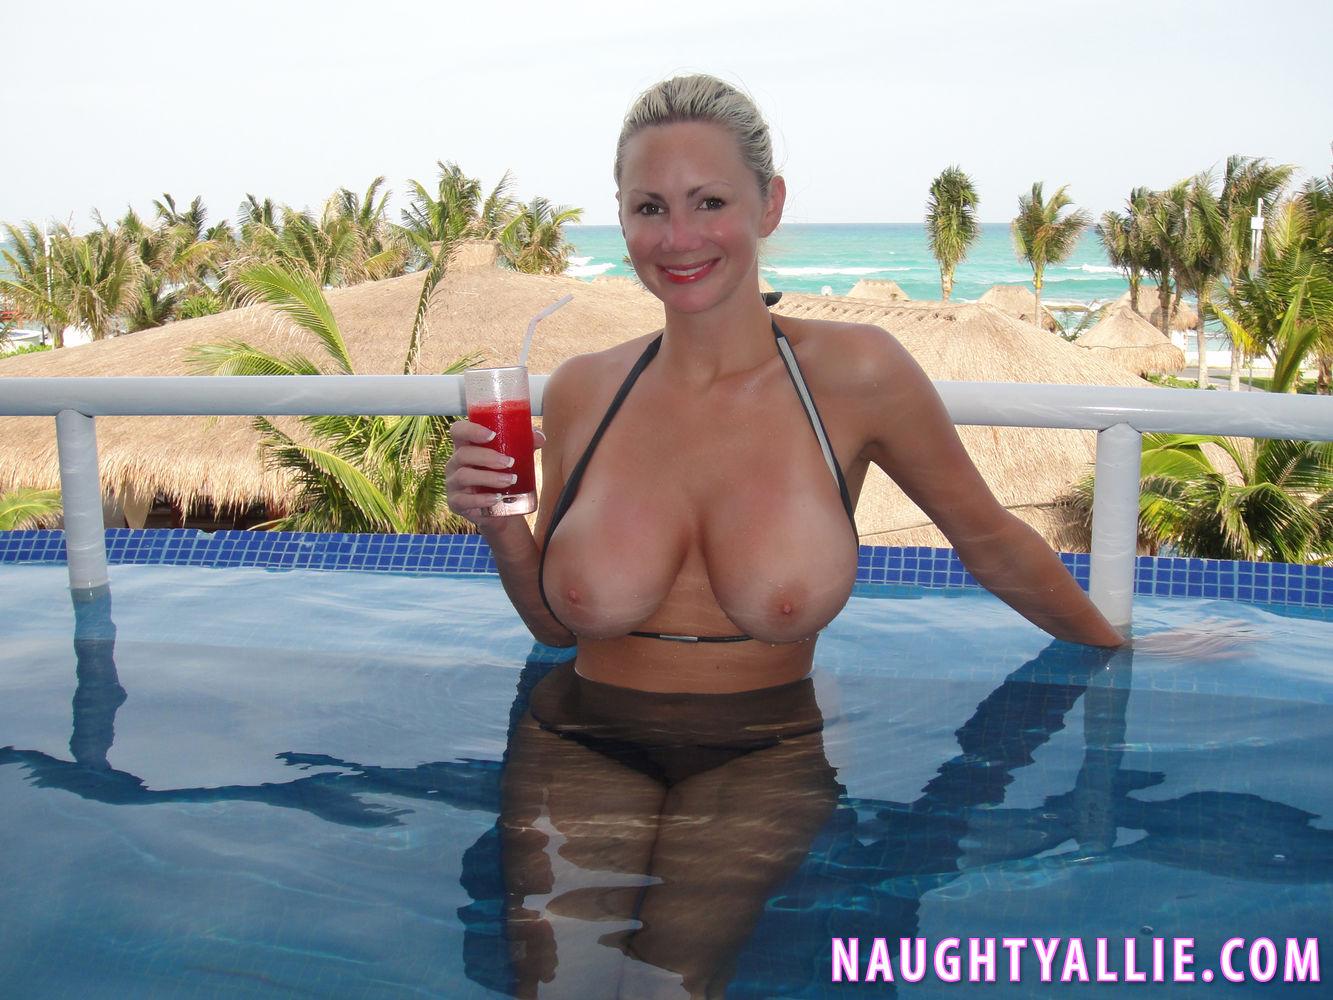 Voyeur topless amateur milfs spy beach closeup hd video 6